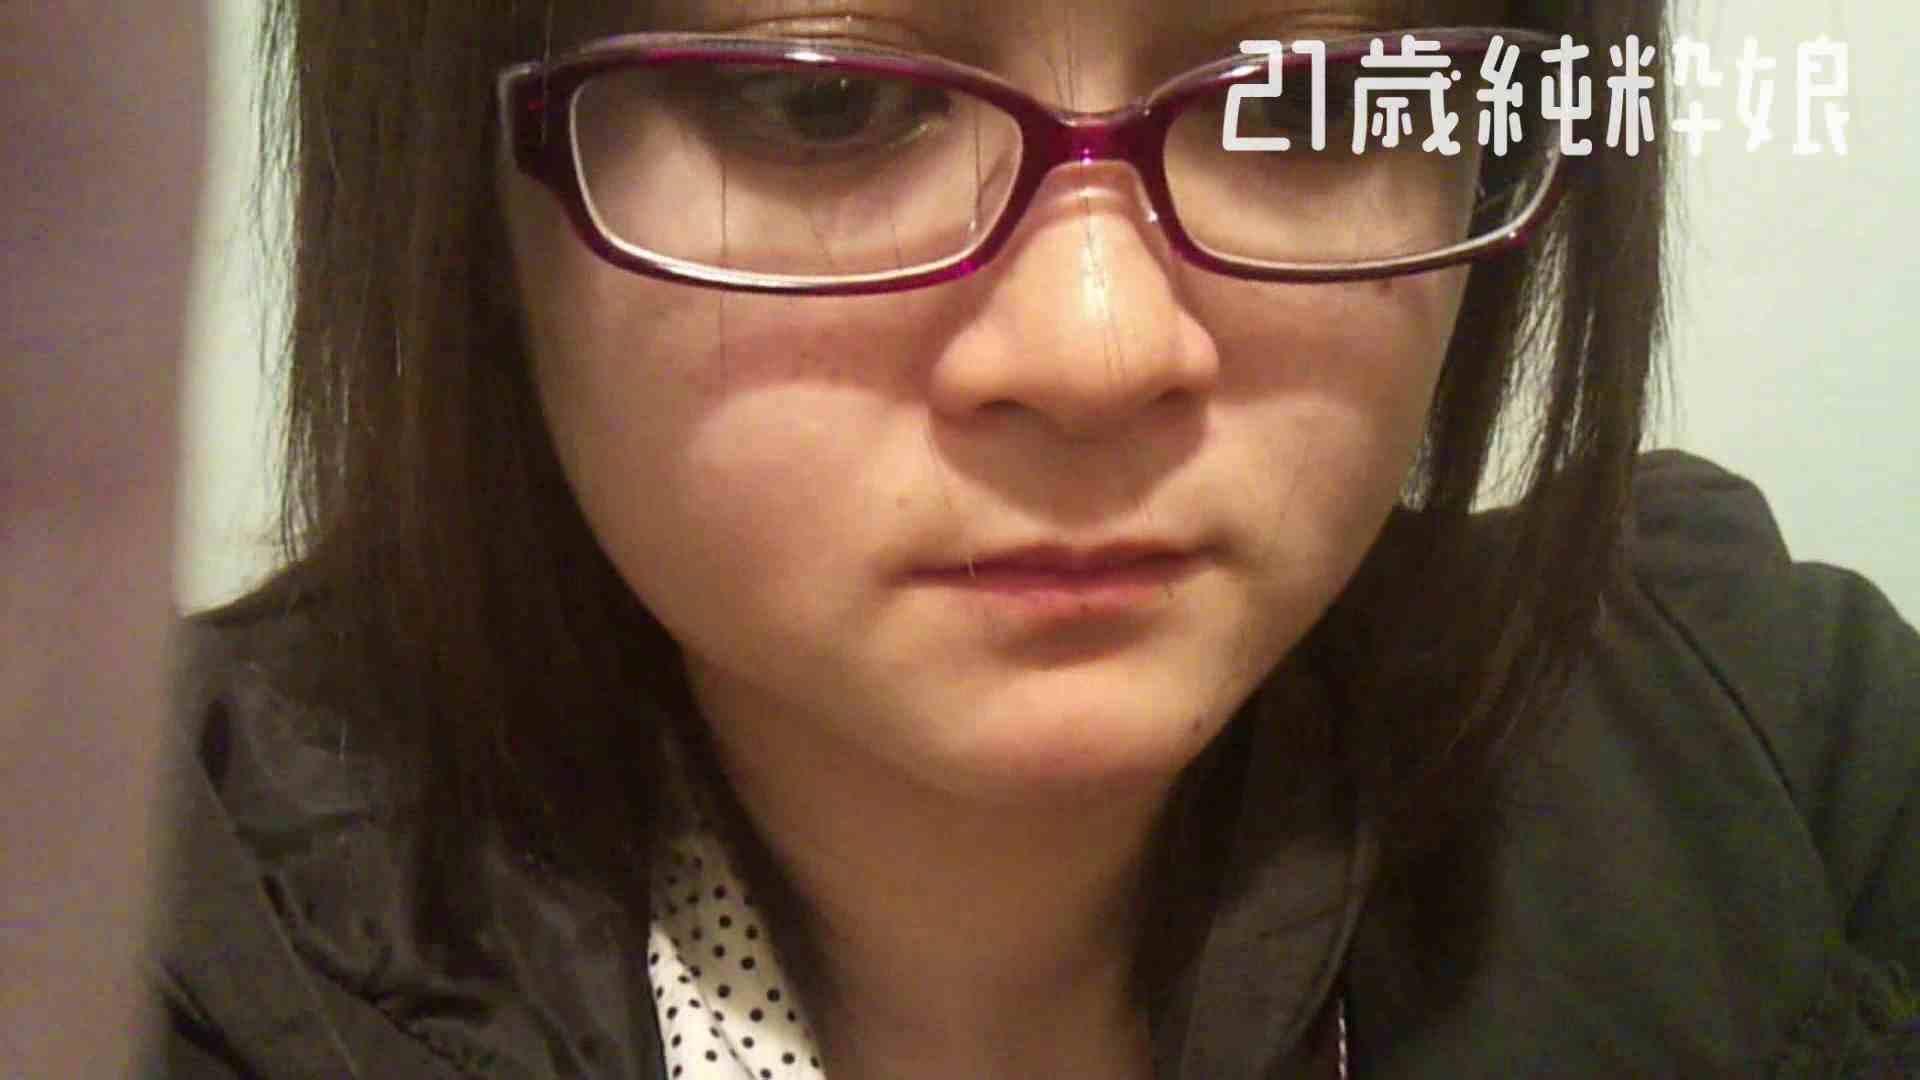 Gカップ21歳純粋嬢第2弾Vol.5 OLヌード天国 | 学校  110PIX 93